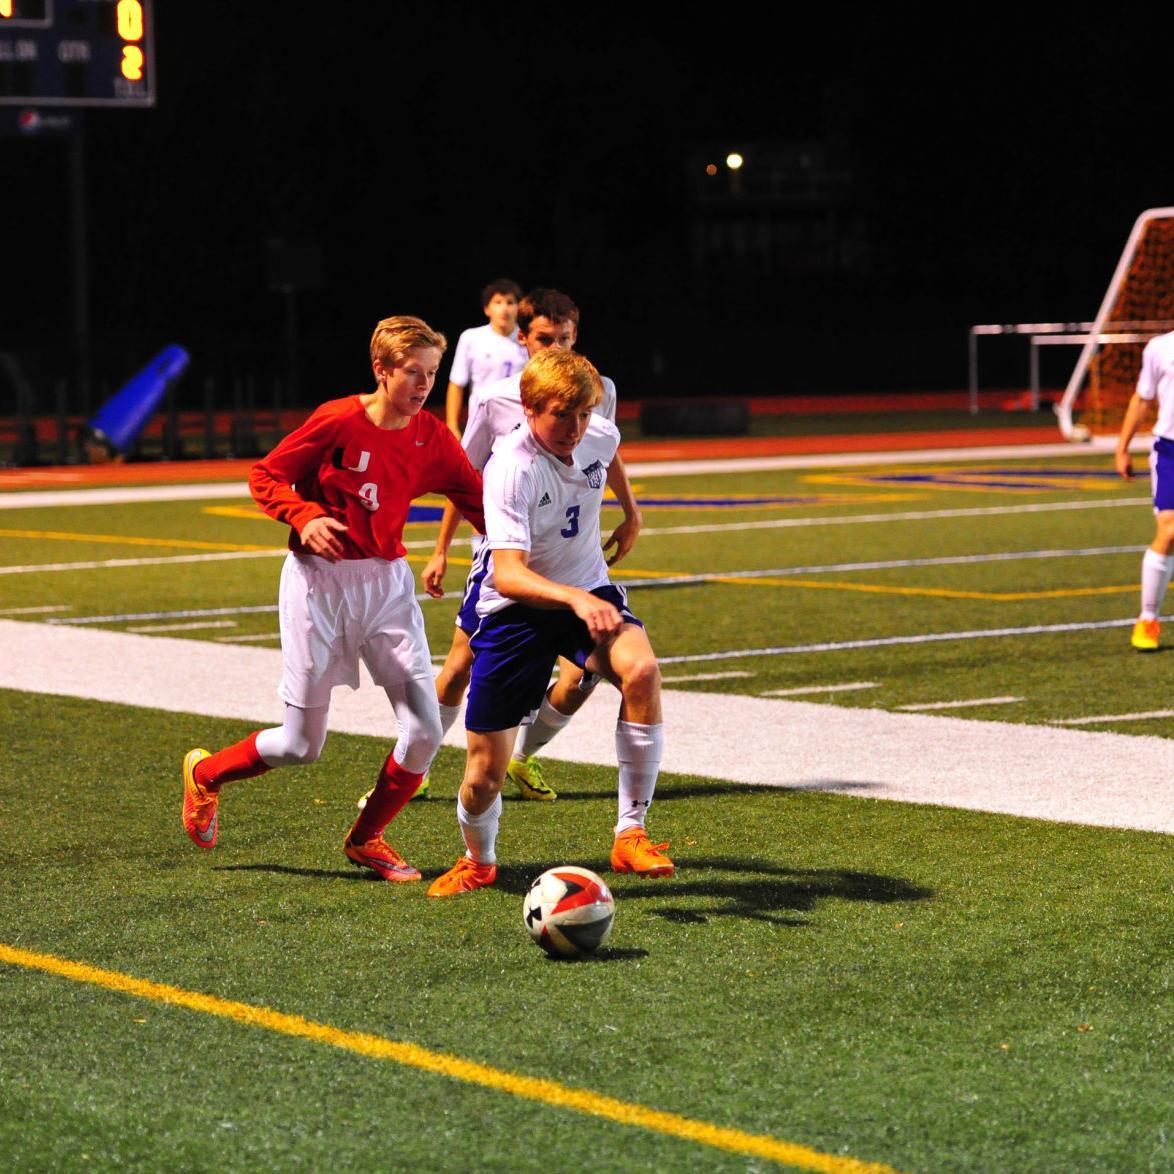 District Boys Soccer — Pacific vs. Union